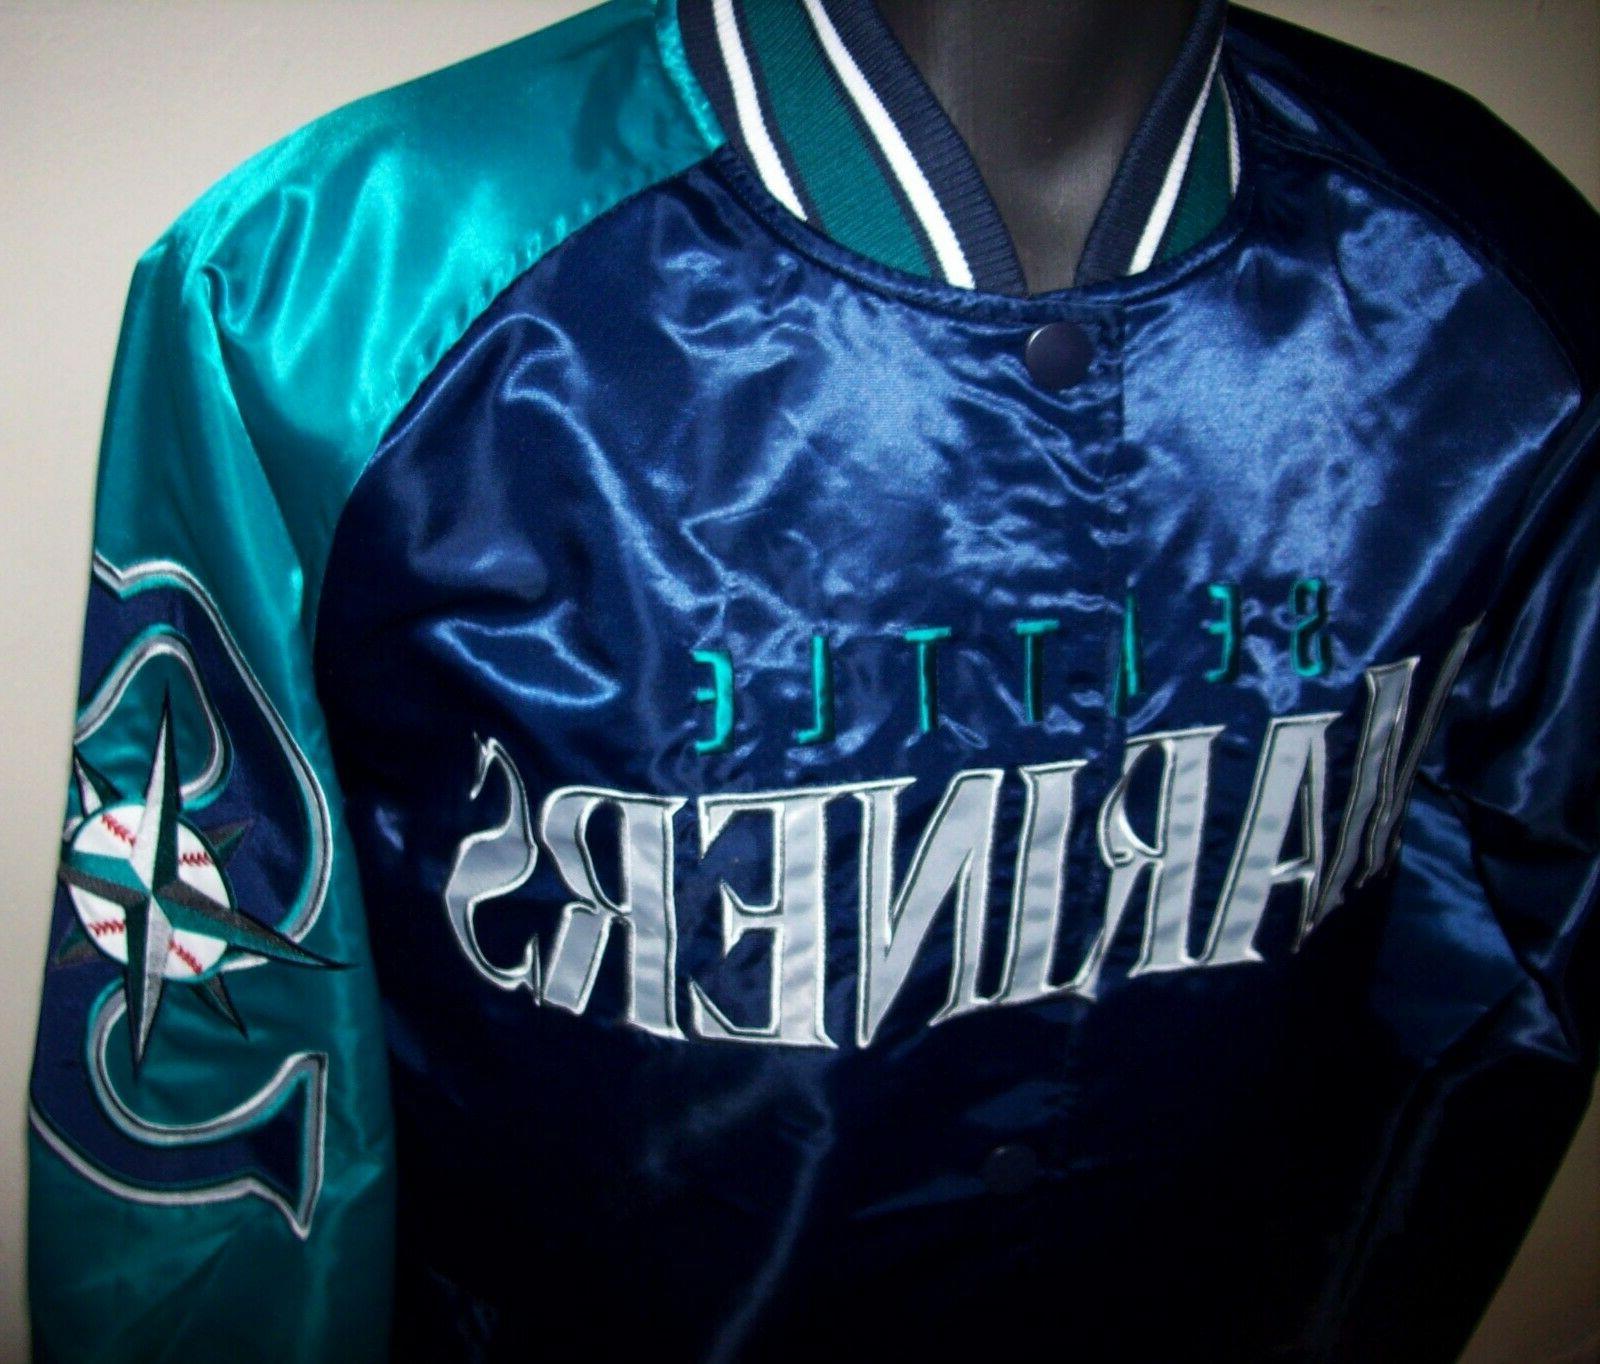 SEATTLE MARINERS Jacket